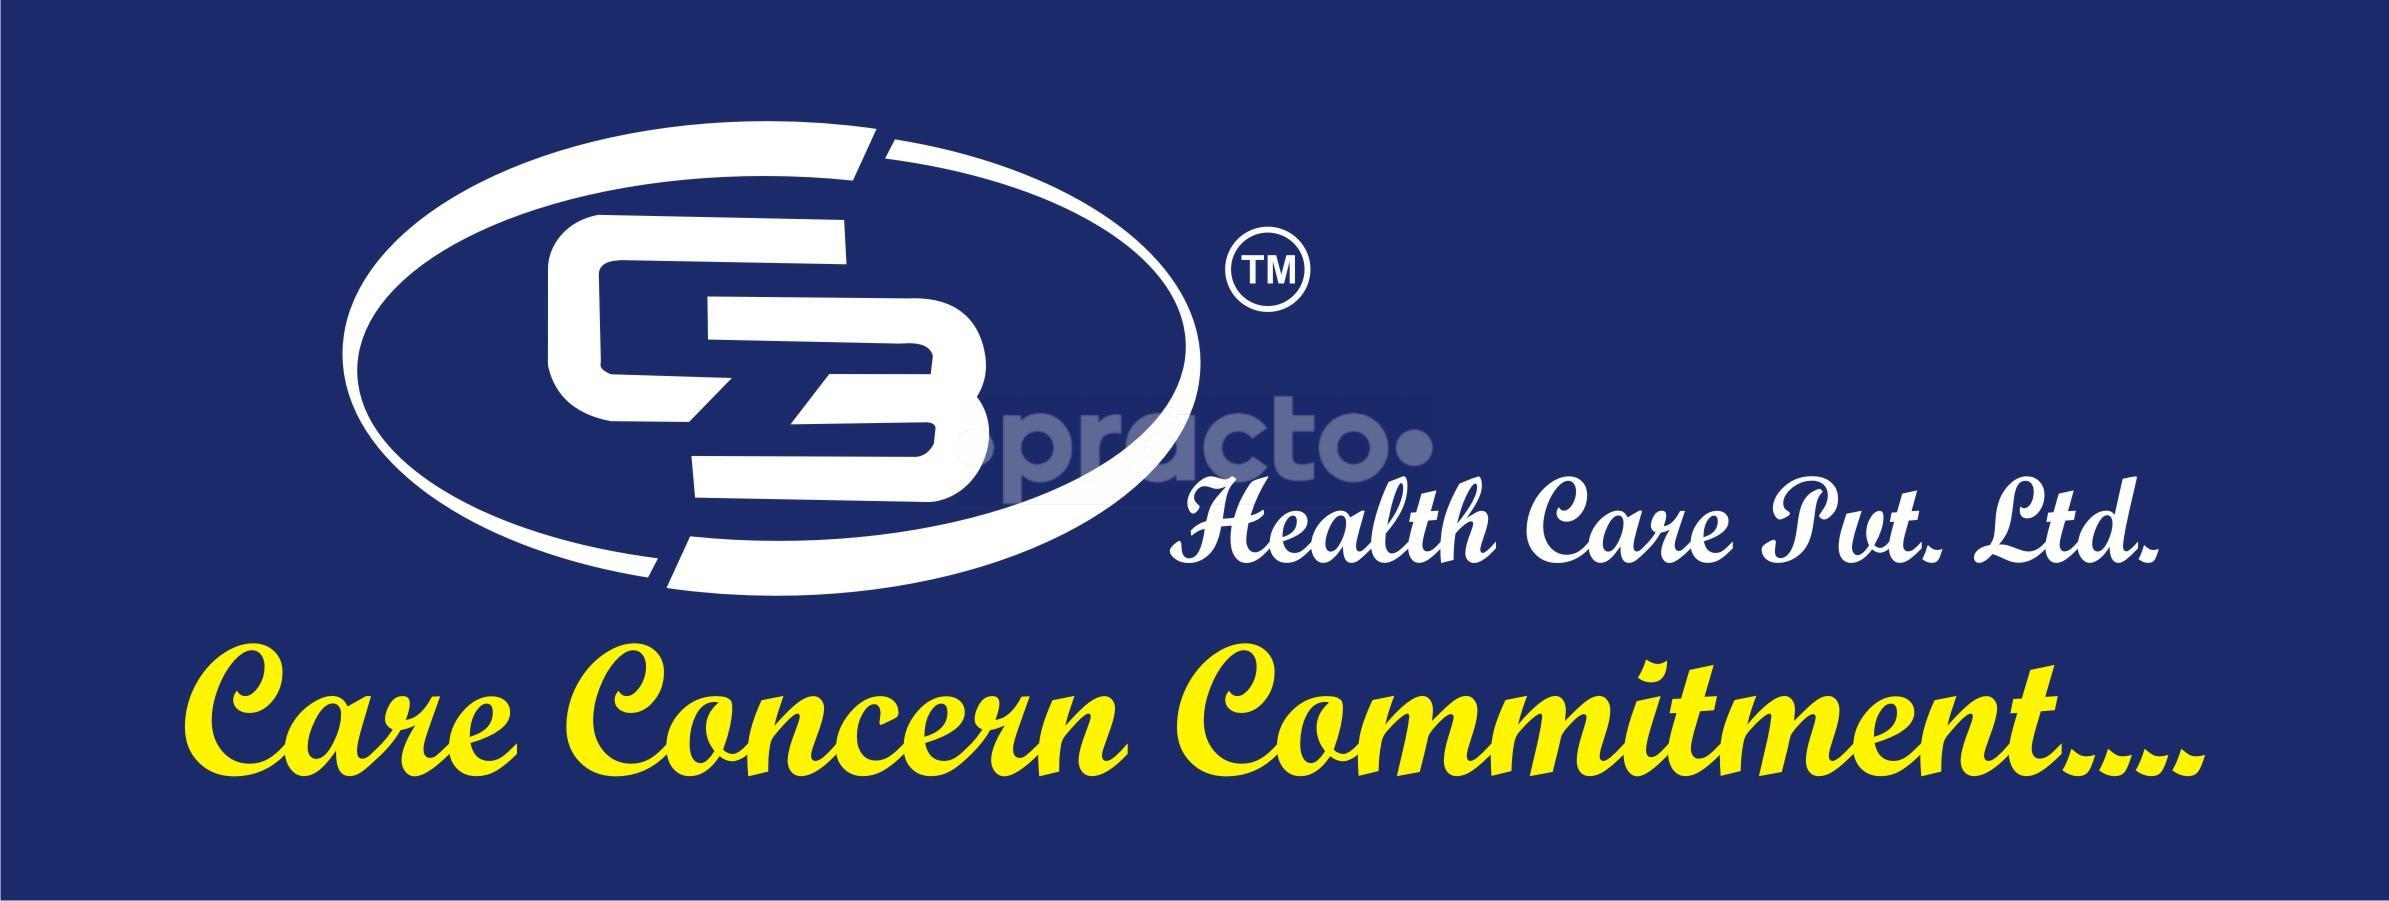 C3 Health Care